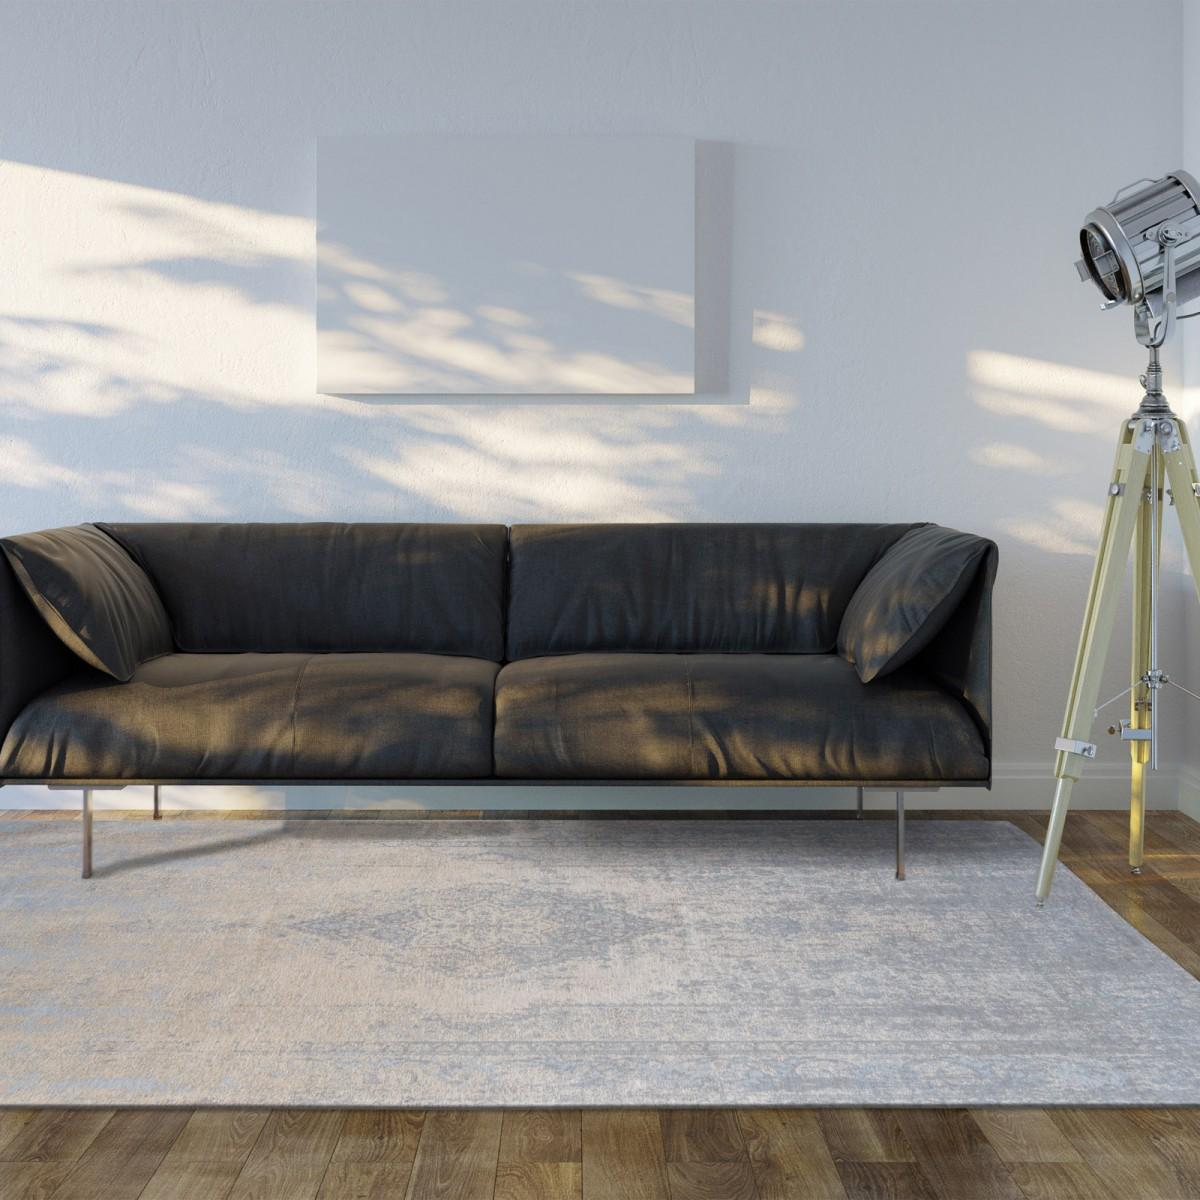 Beige Sky 8633 | Louis de Poortere Generation Collection Rugs | Best at Flooring